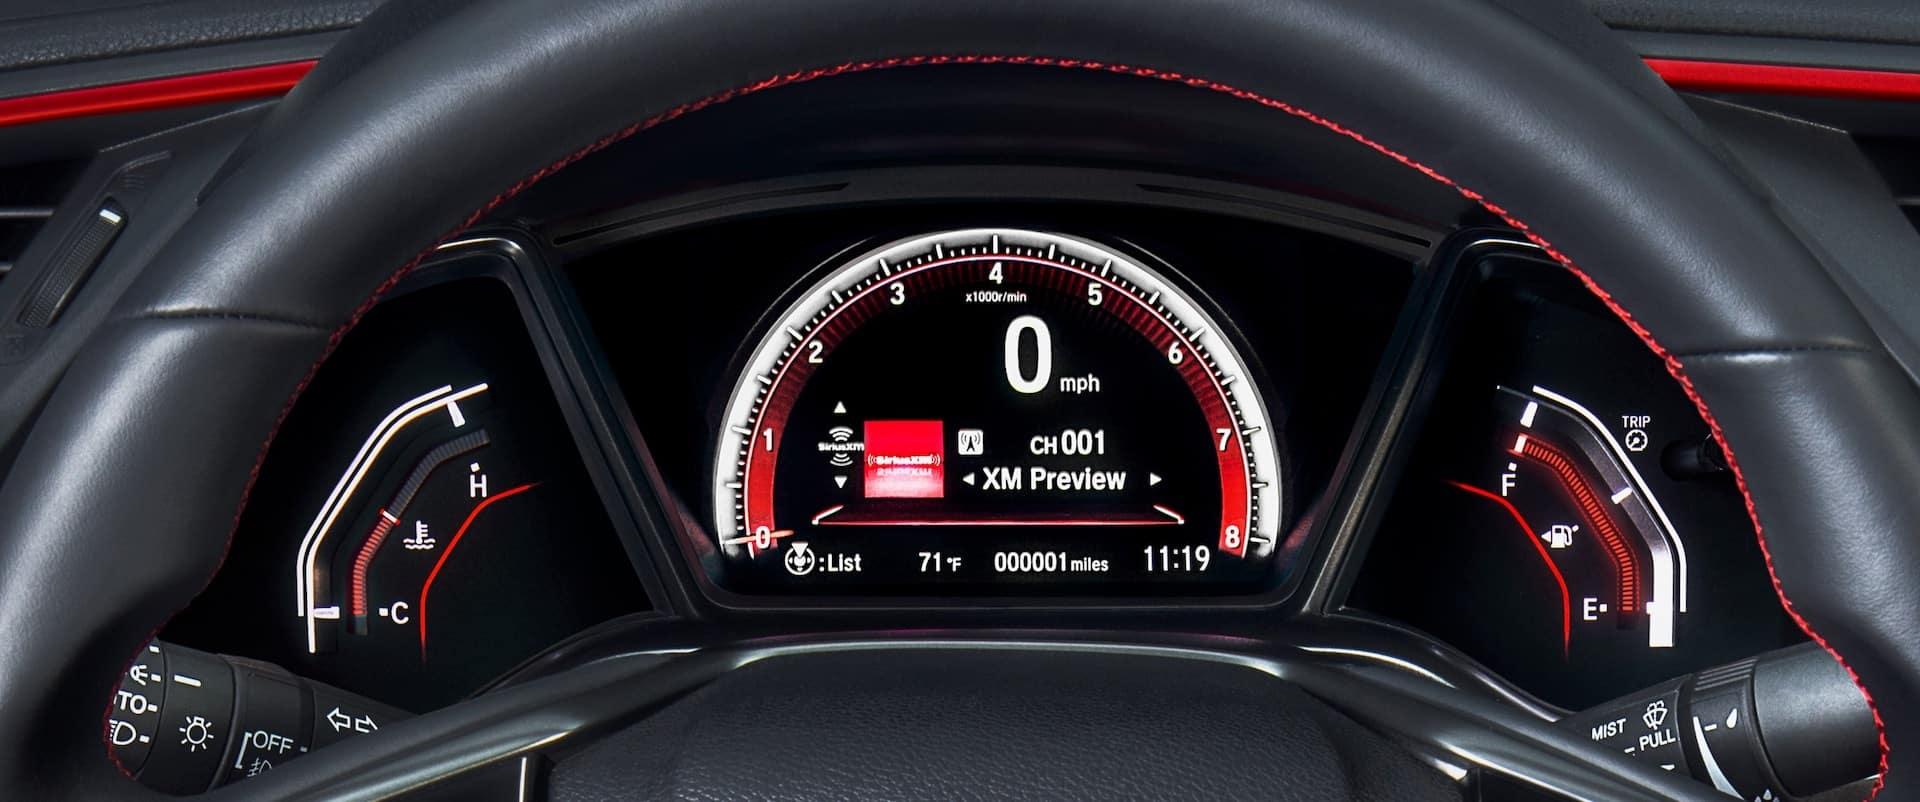 Honda_Civic_Si_Coupe_Interior_Digital_Cockpit